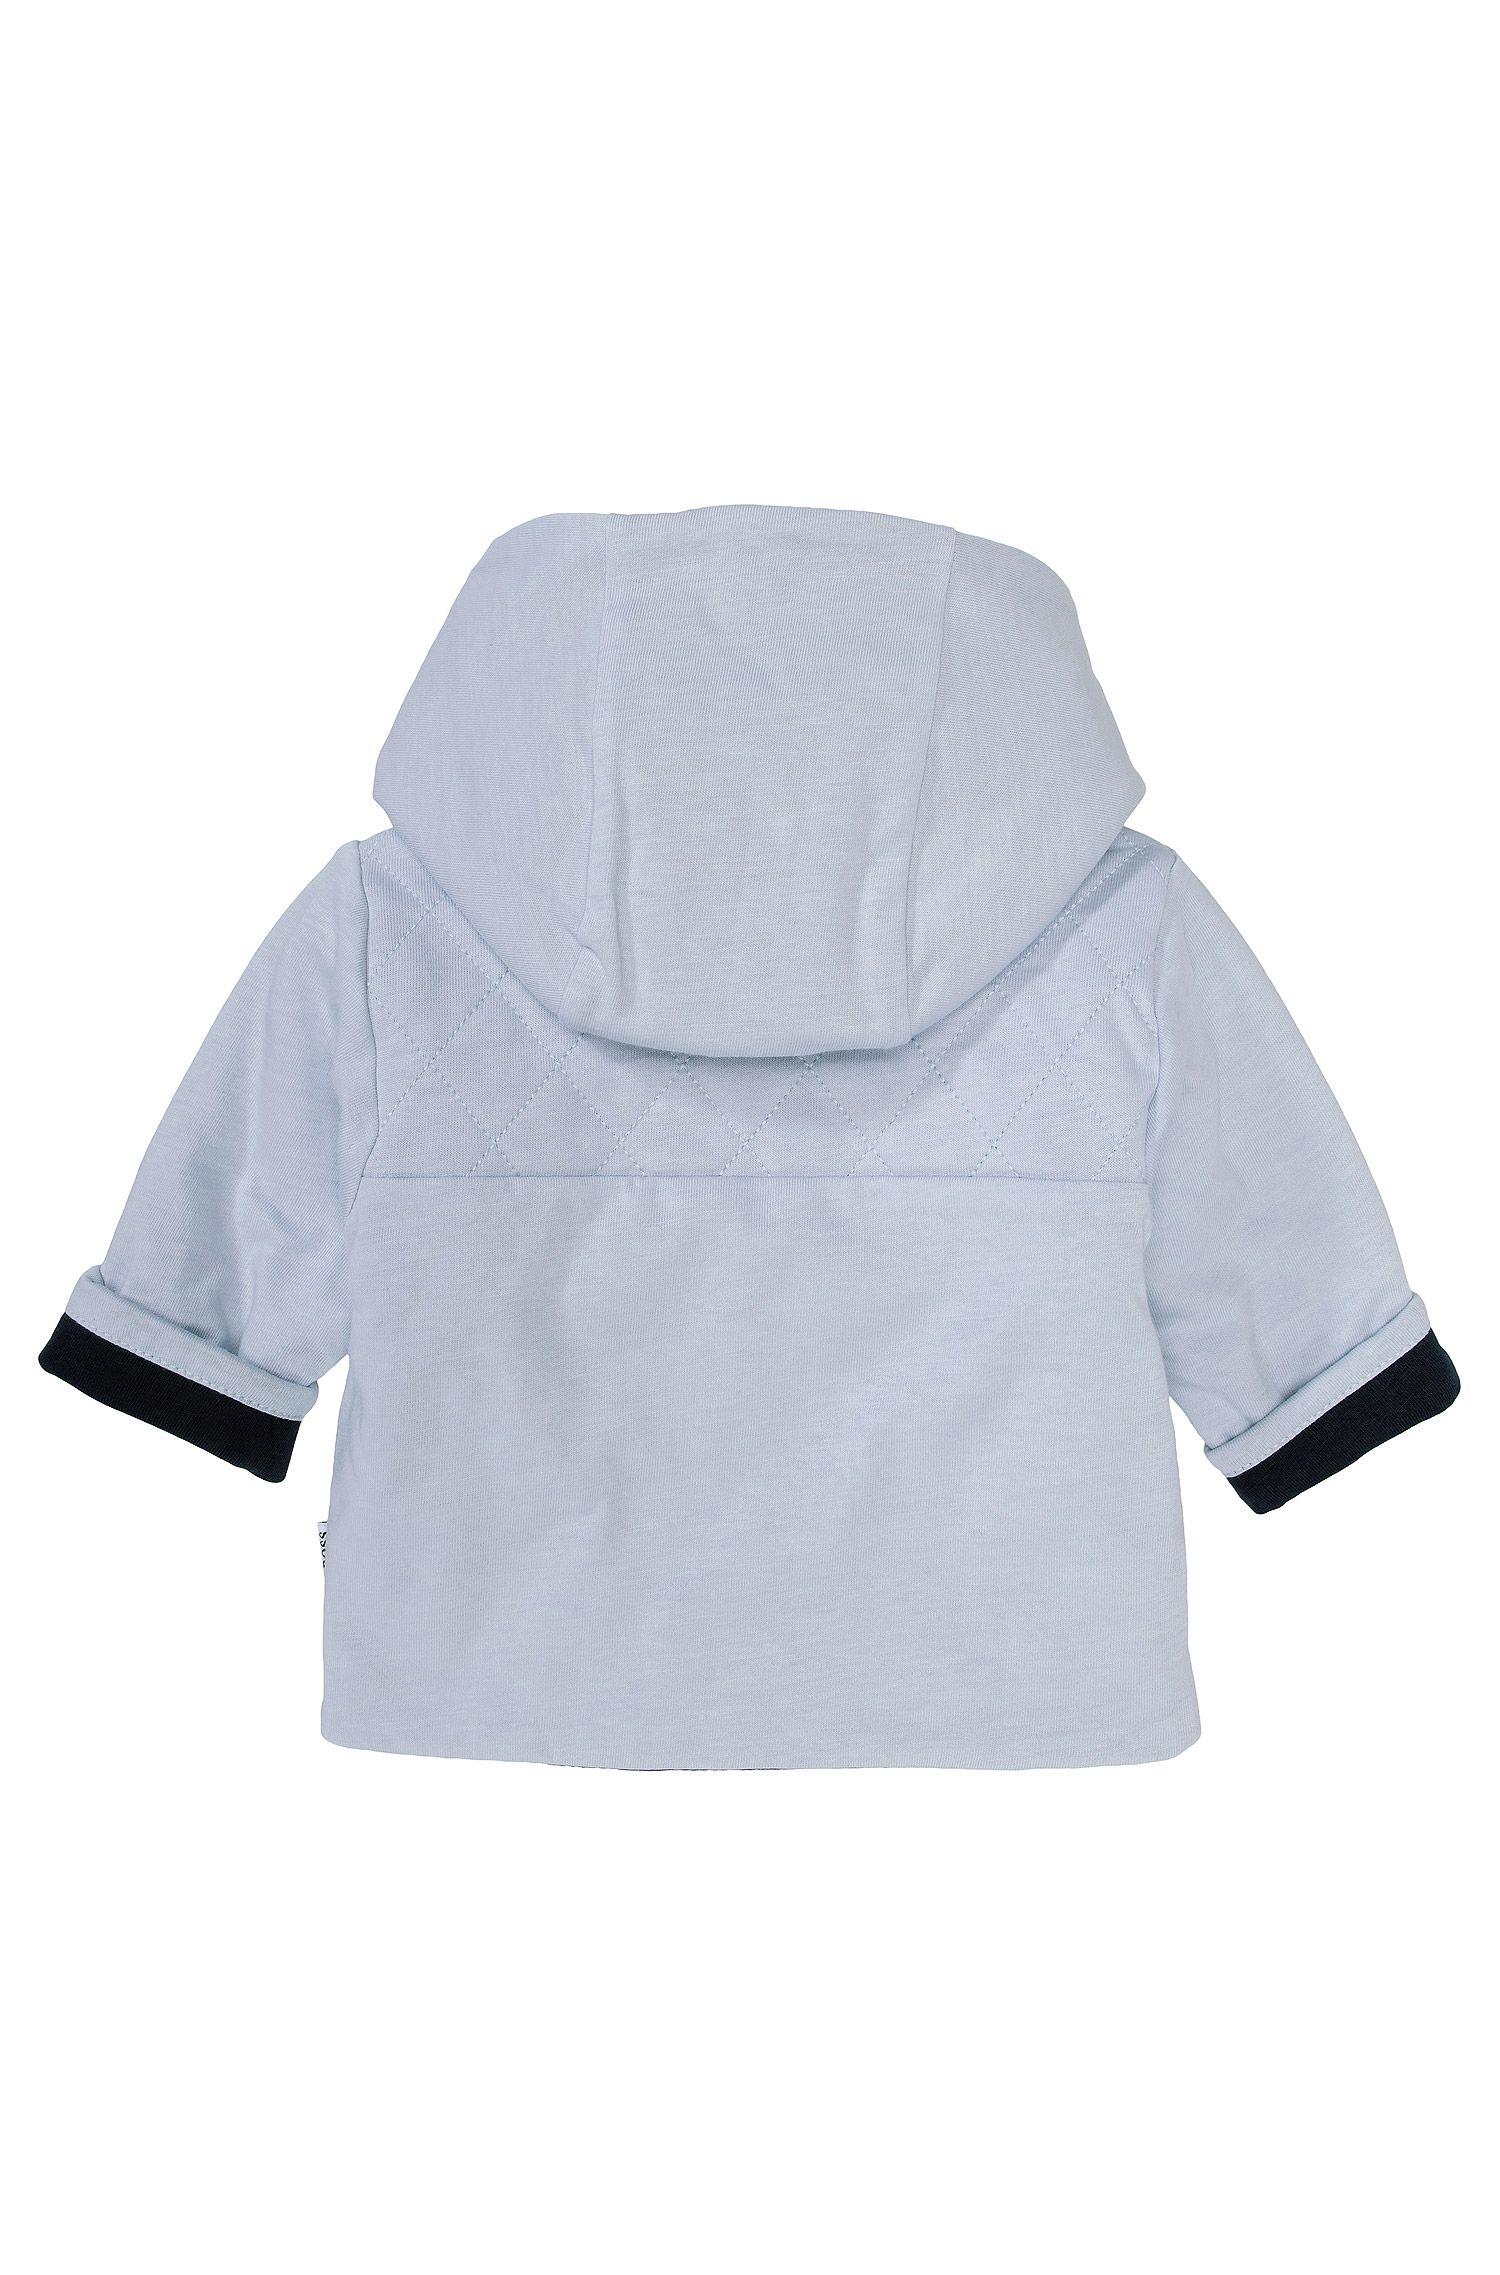 Kids-Kapuzen-Jacke ´J95141` aus Baumwolle